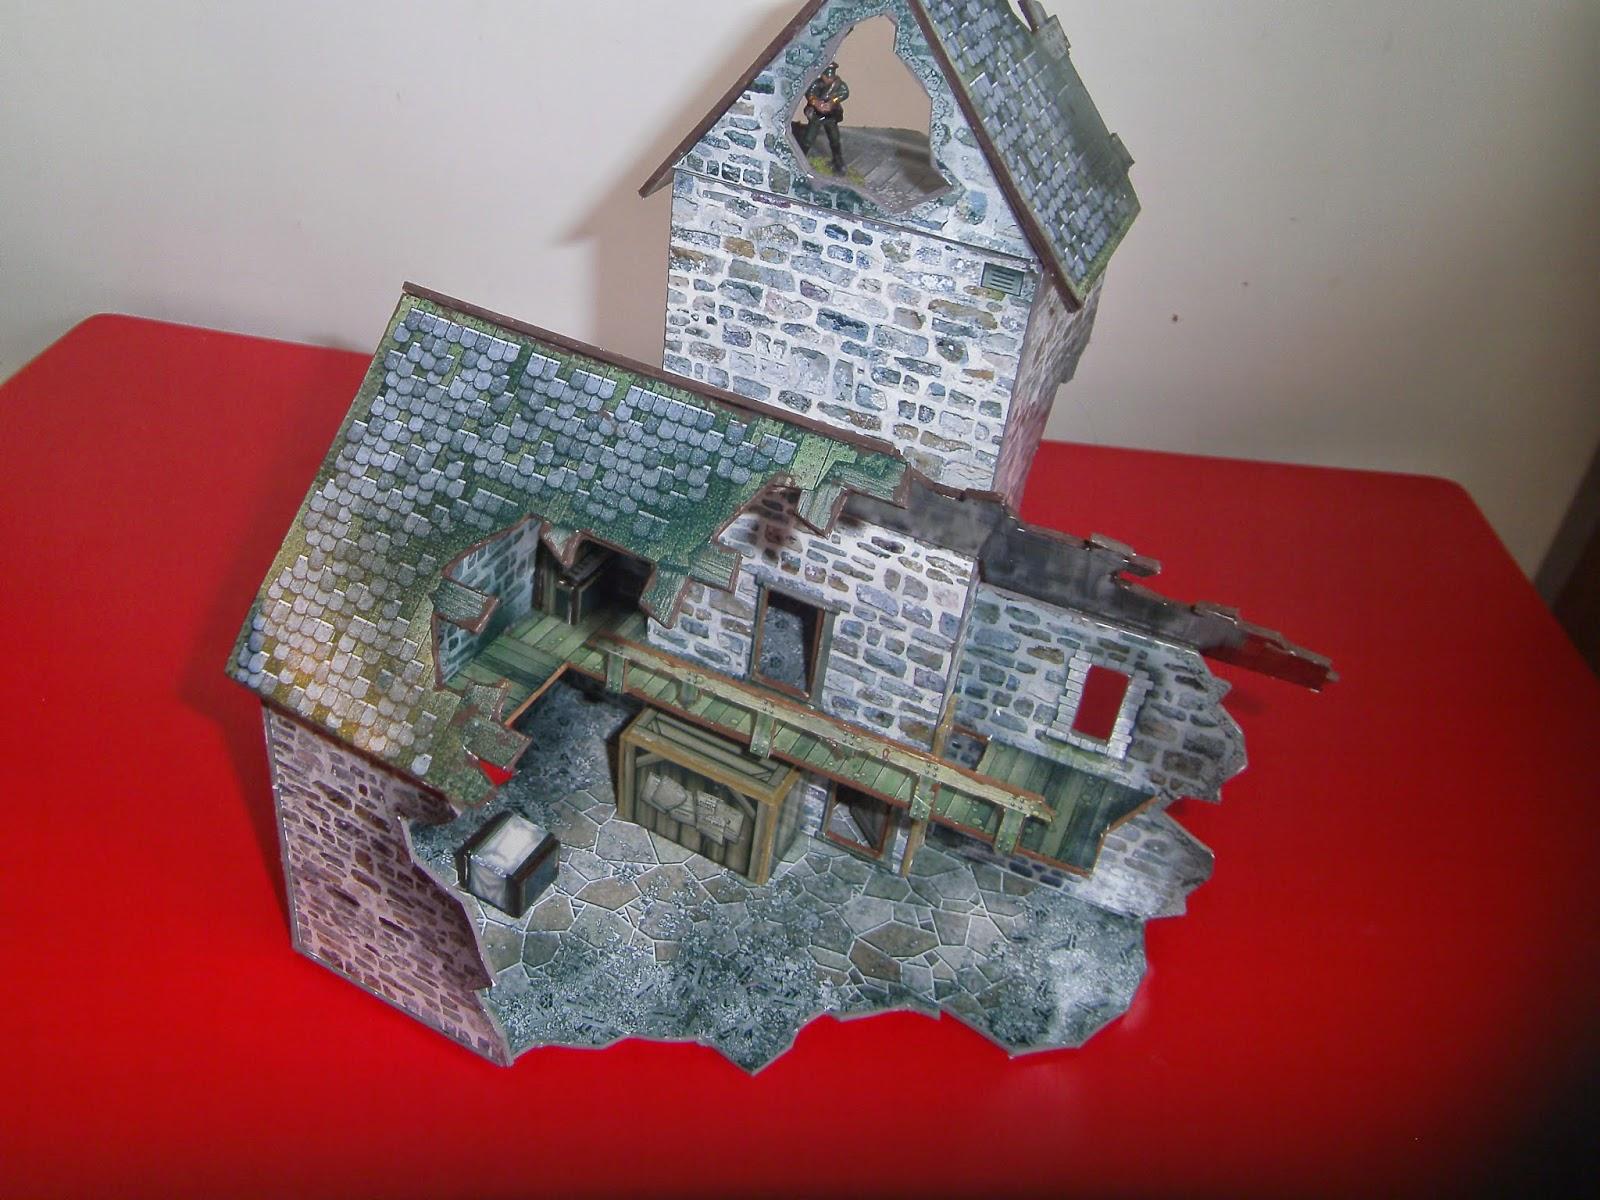 Republic-The Irish Civil War Game: Church Ruin From Dave Graffam models